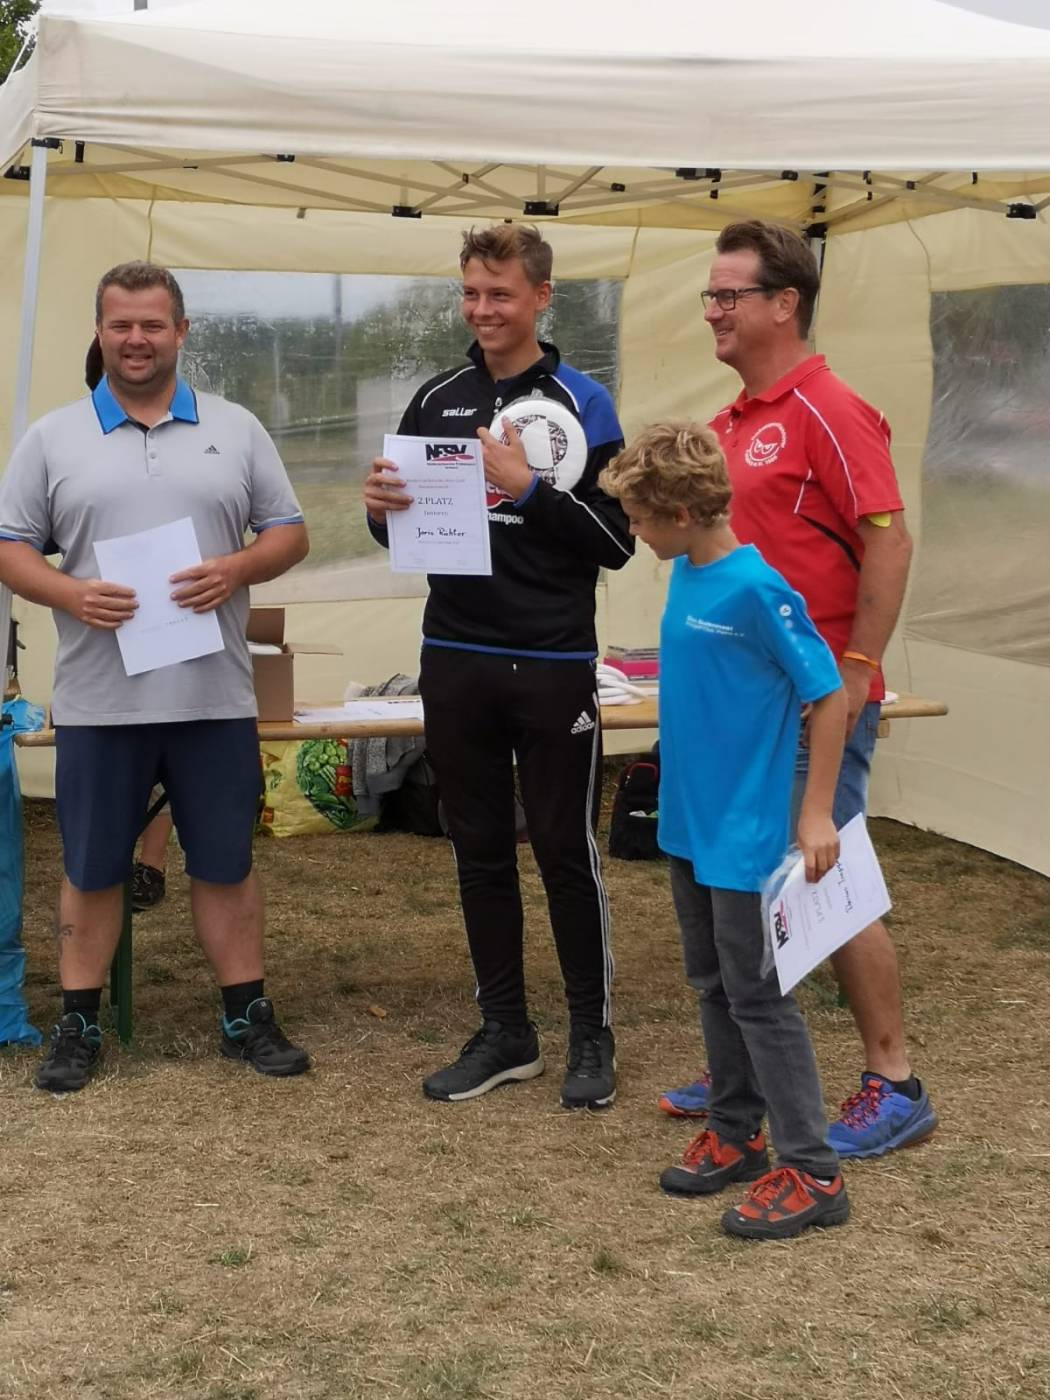 2018-09-02_NDS Landesmeisterschaft Discgolf Hannover 2018_036